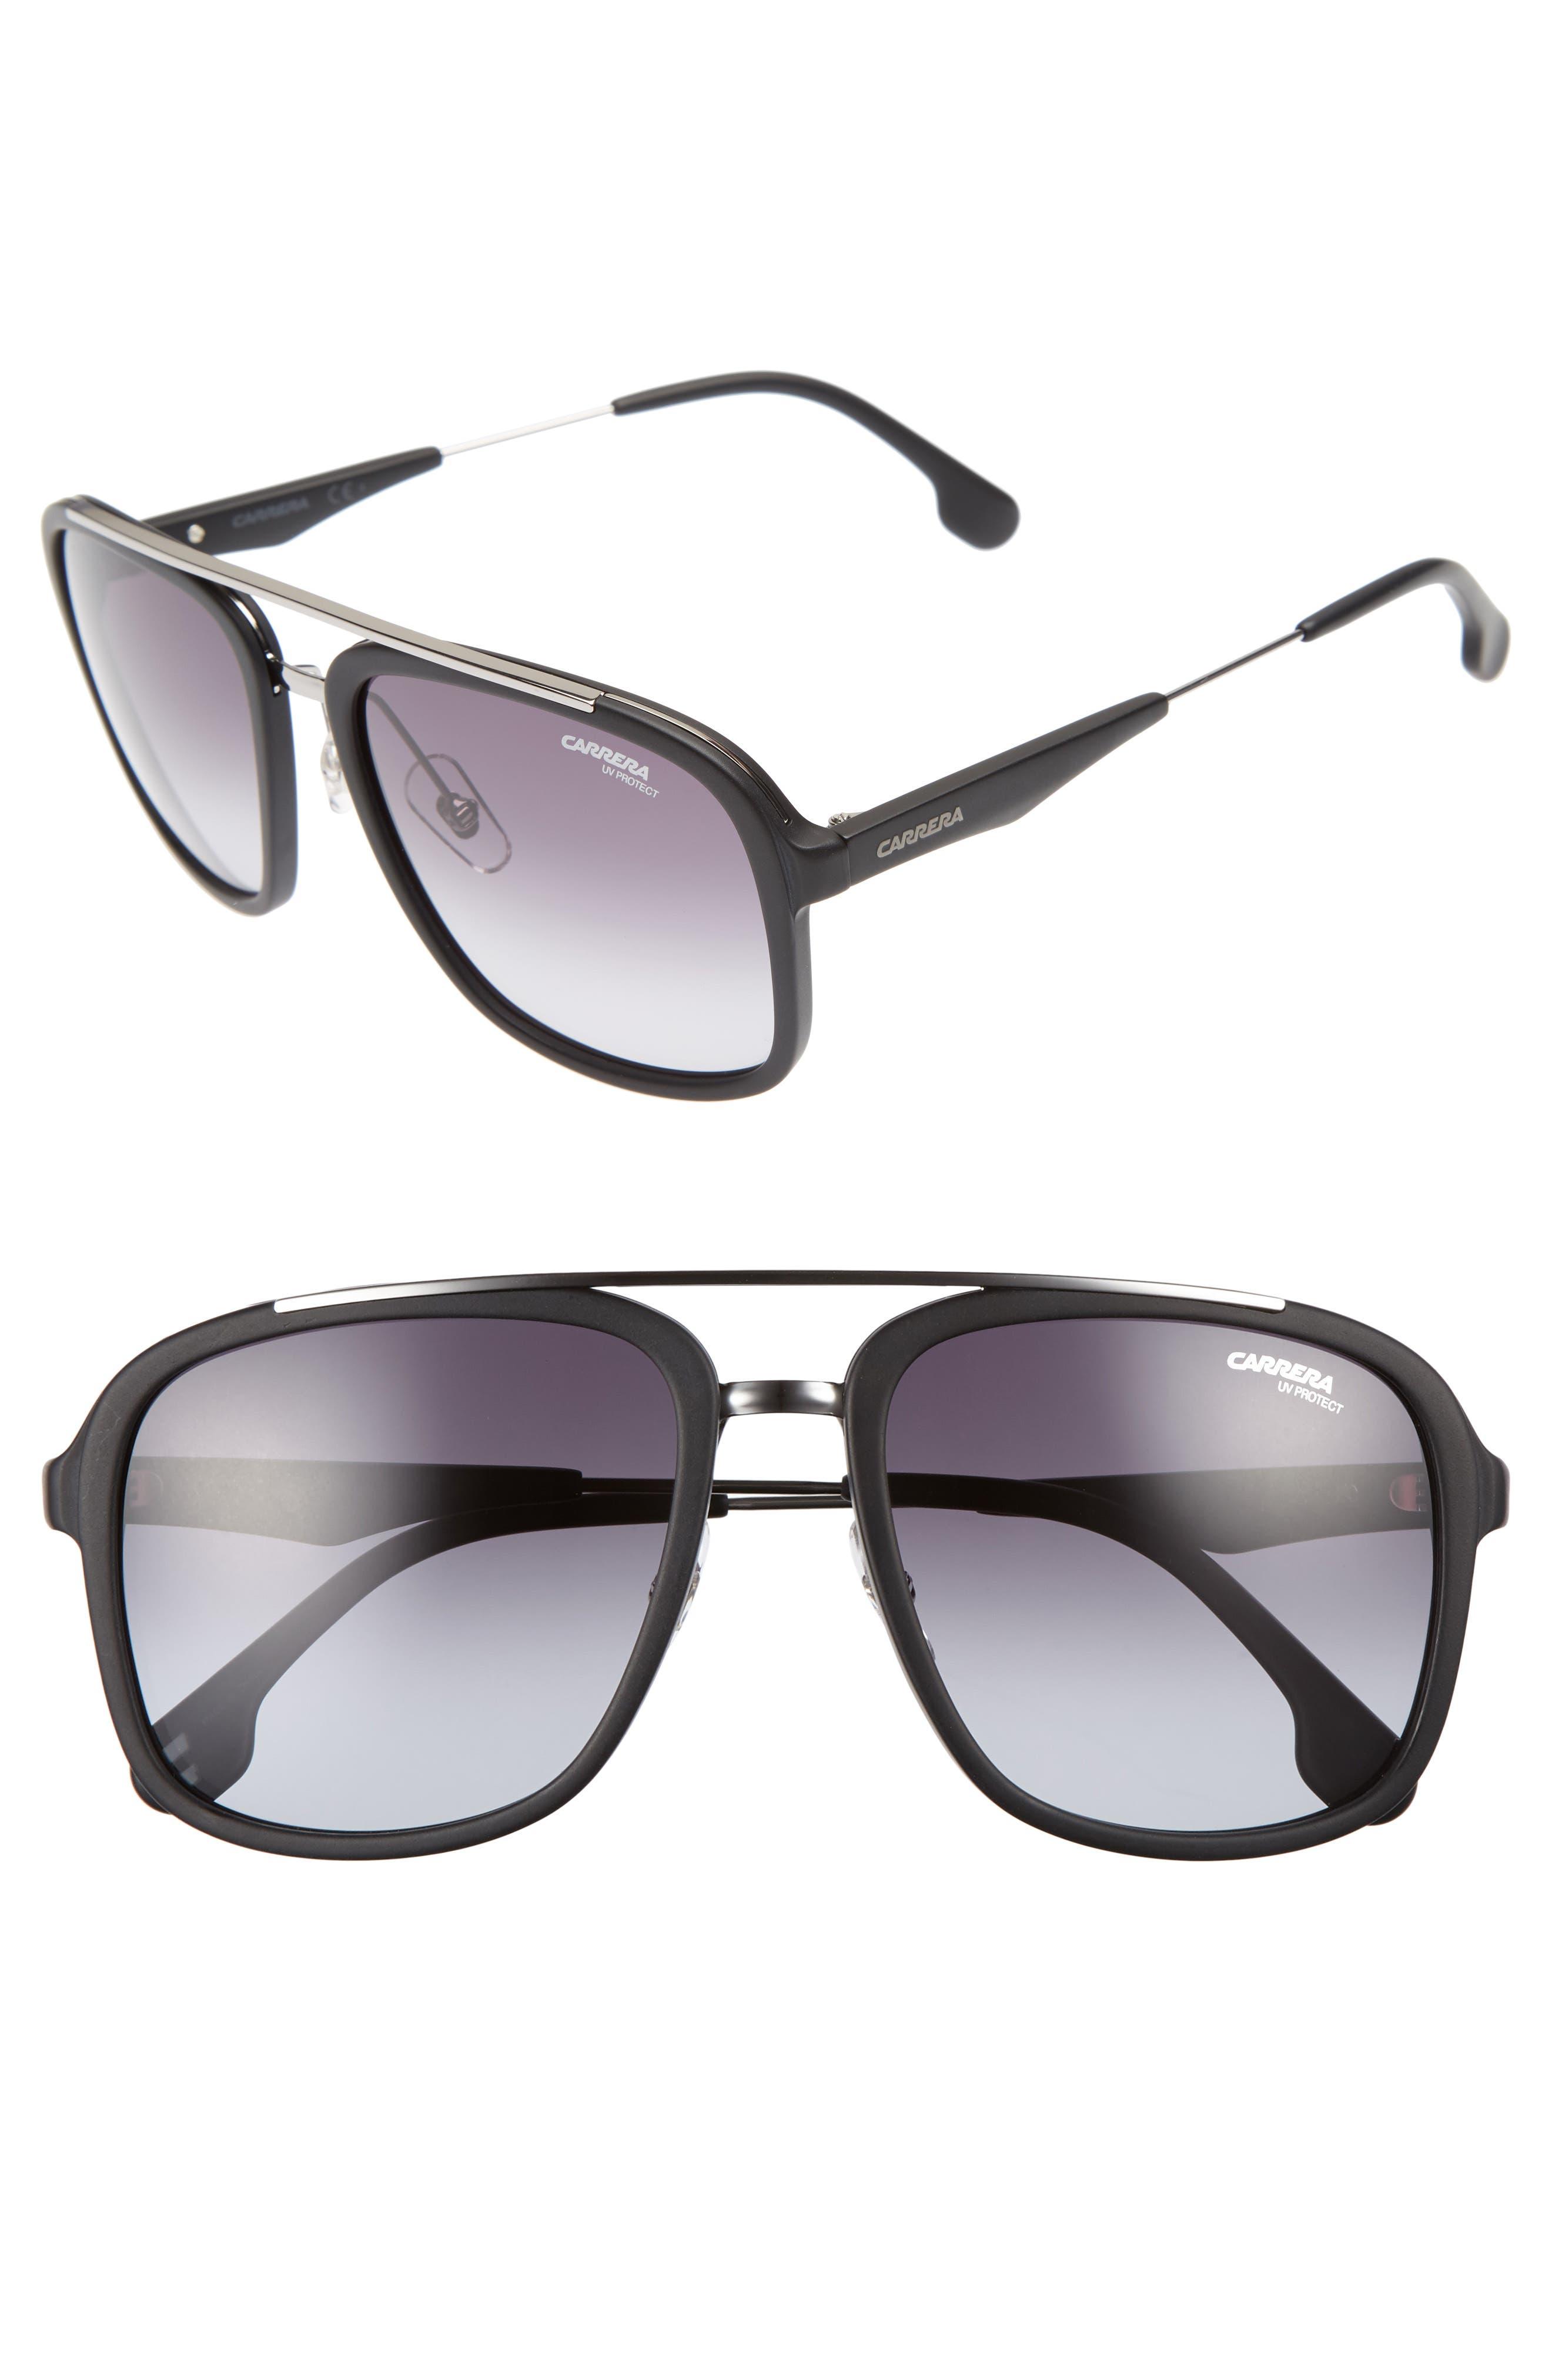 Carrera Eyewear 57Mm Sunglasses -